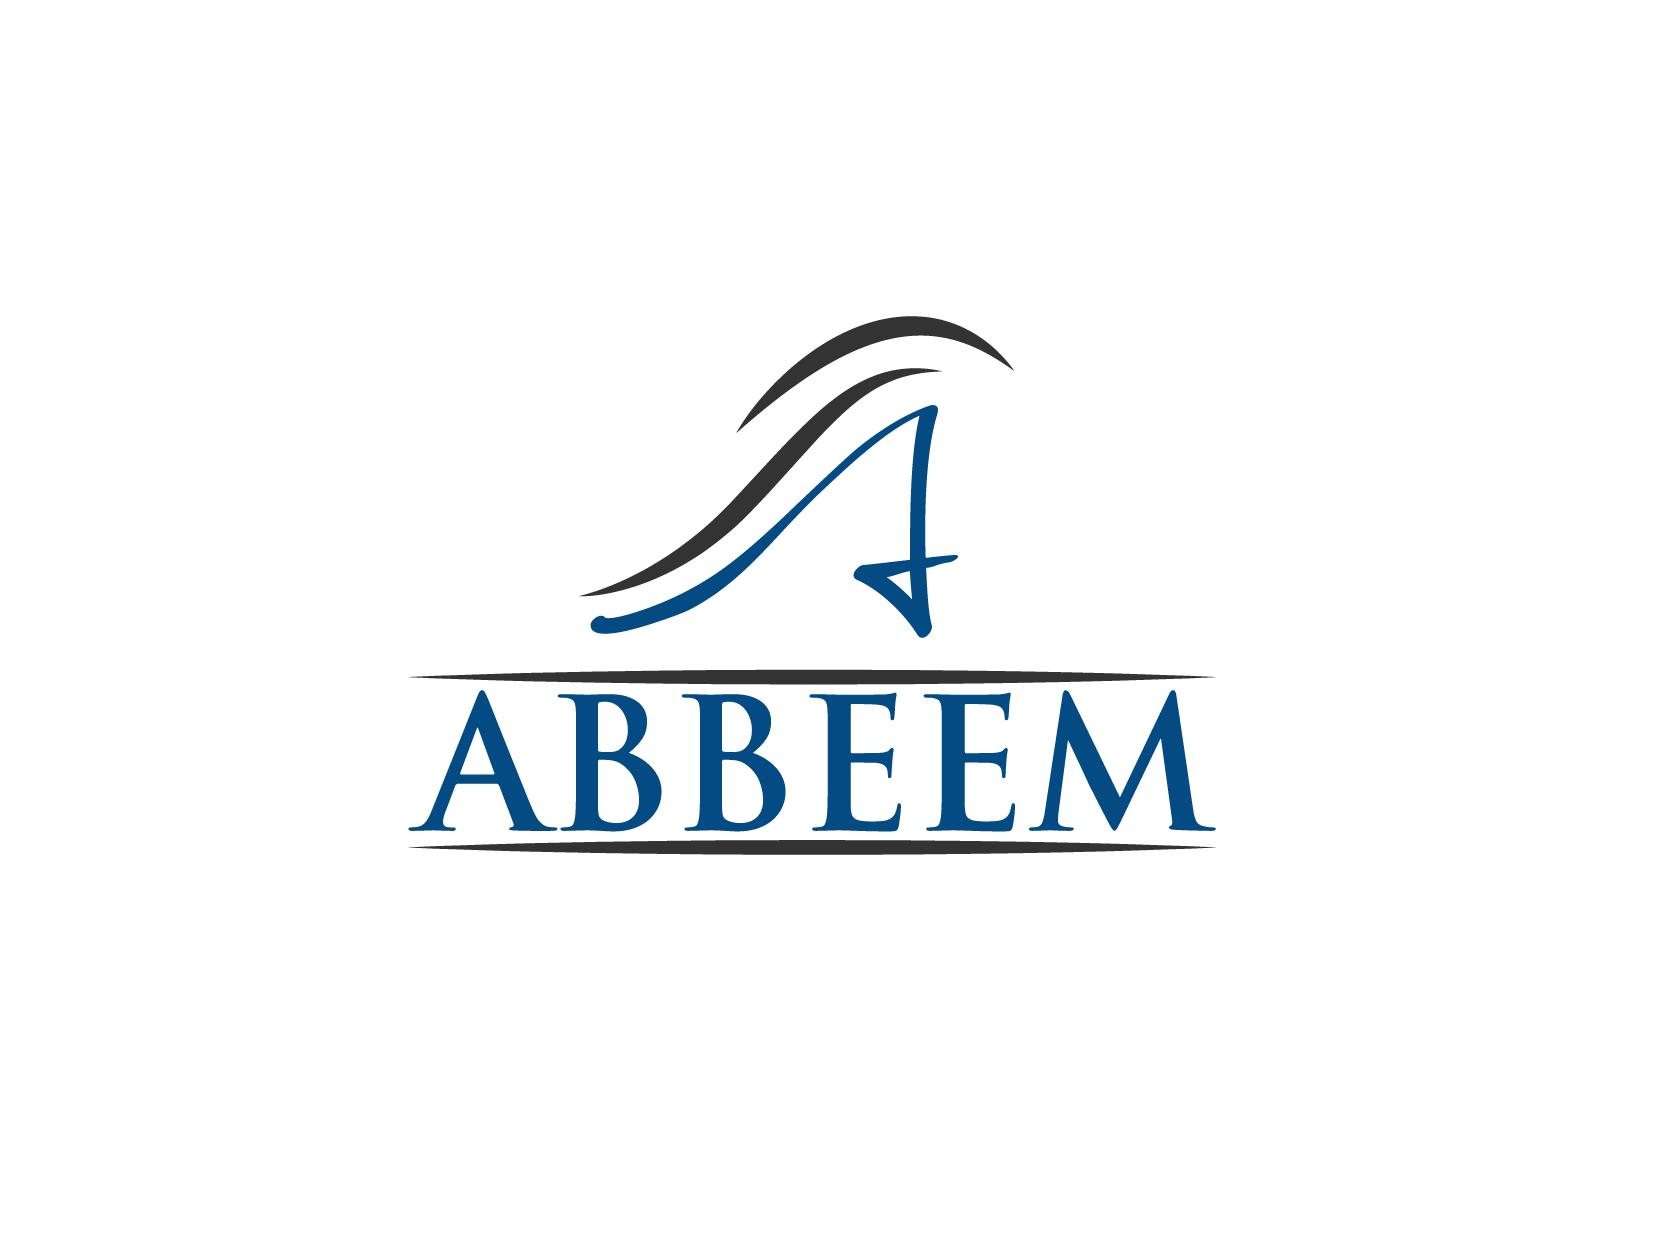 Logo Design by Faraz Baloch - Entry No. 145 in the Logo Design Contest Luxury Logo Design for Abbeem.